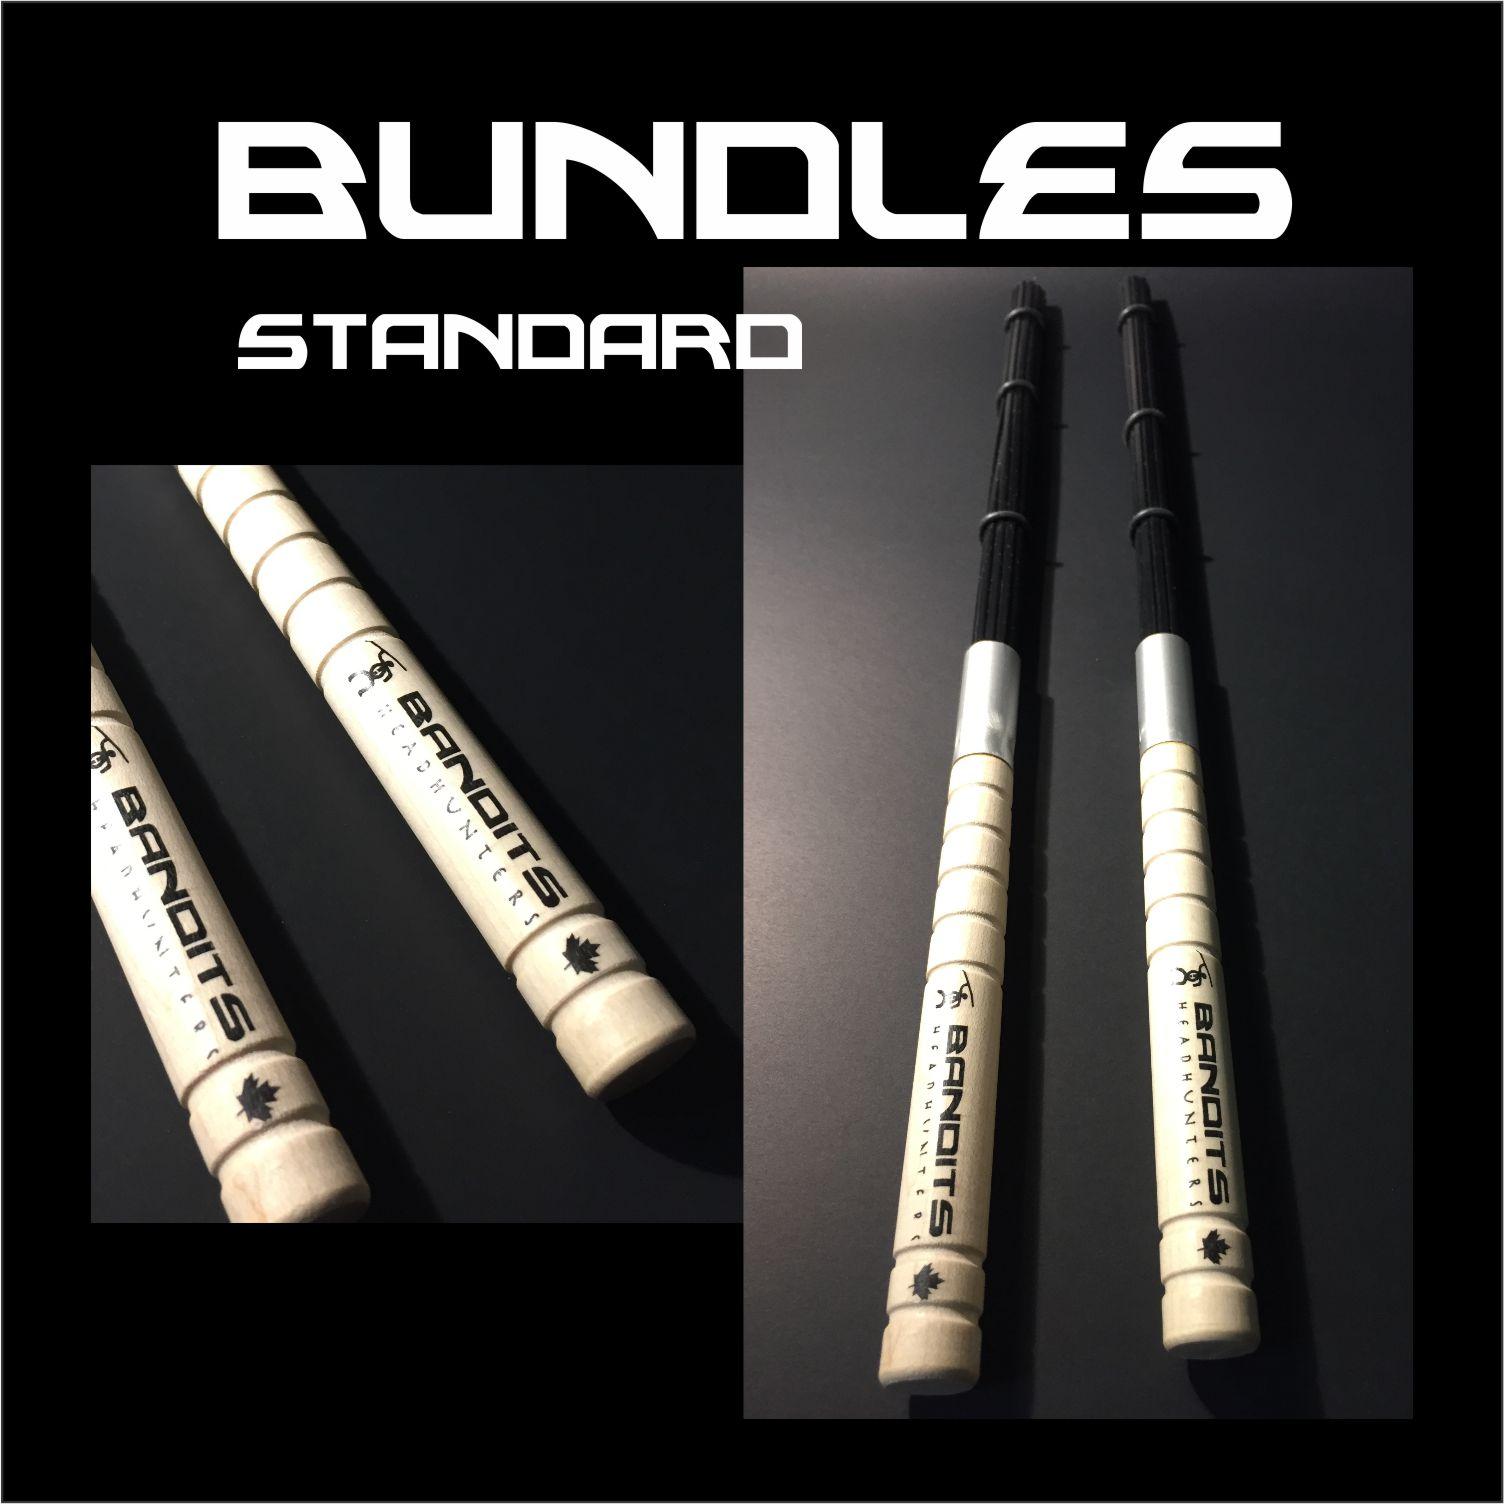 Bundles- Standard